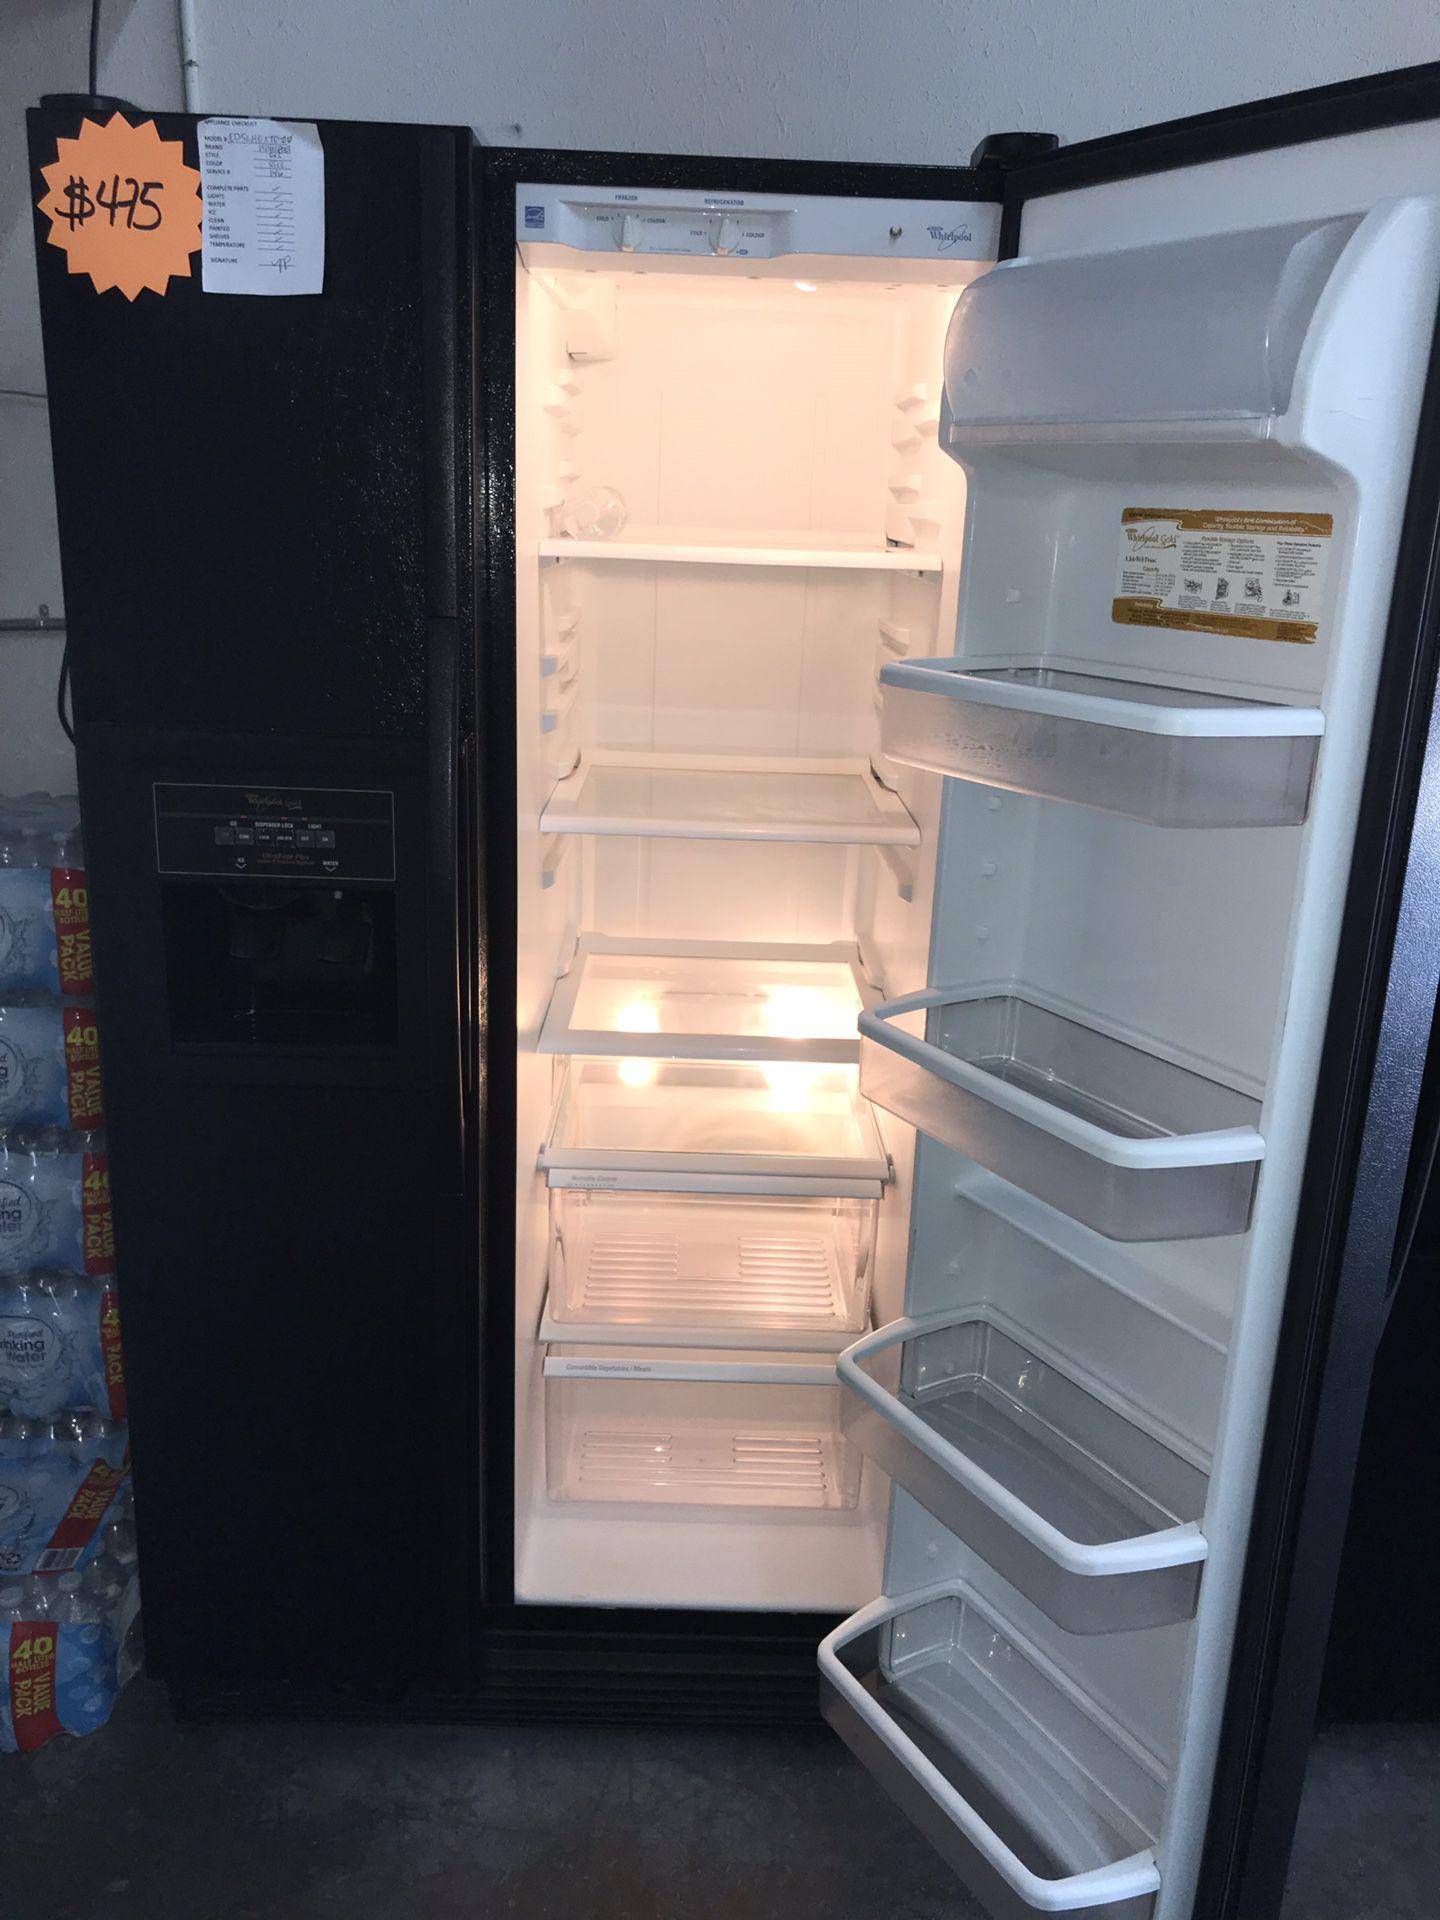 Black Whirlpool Refrigerator Side By Side